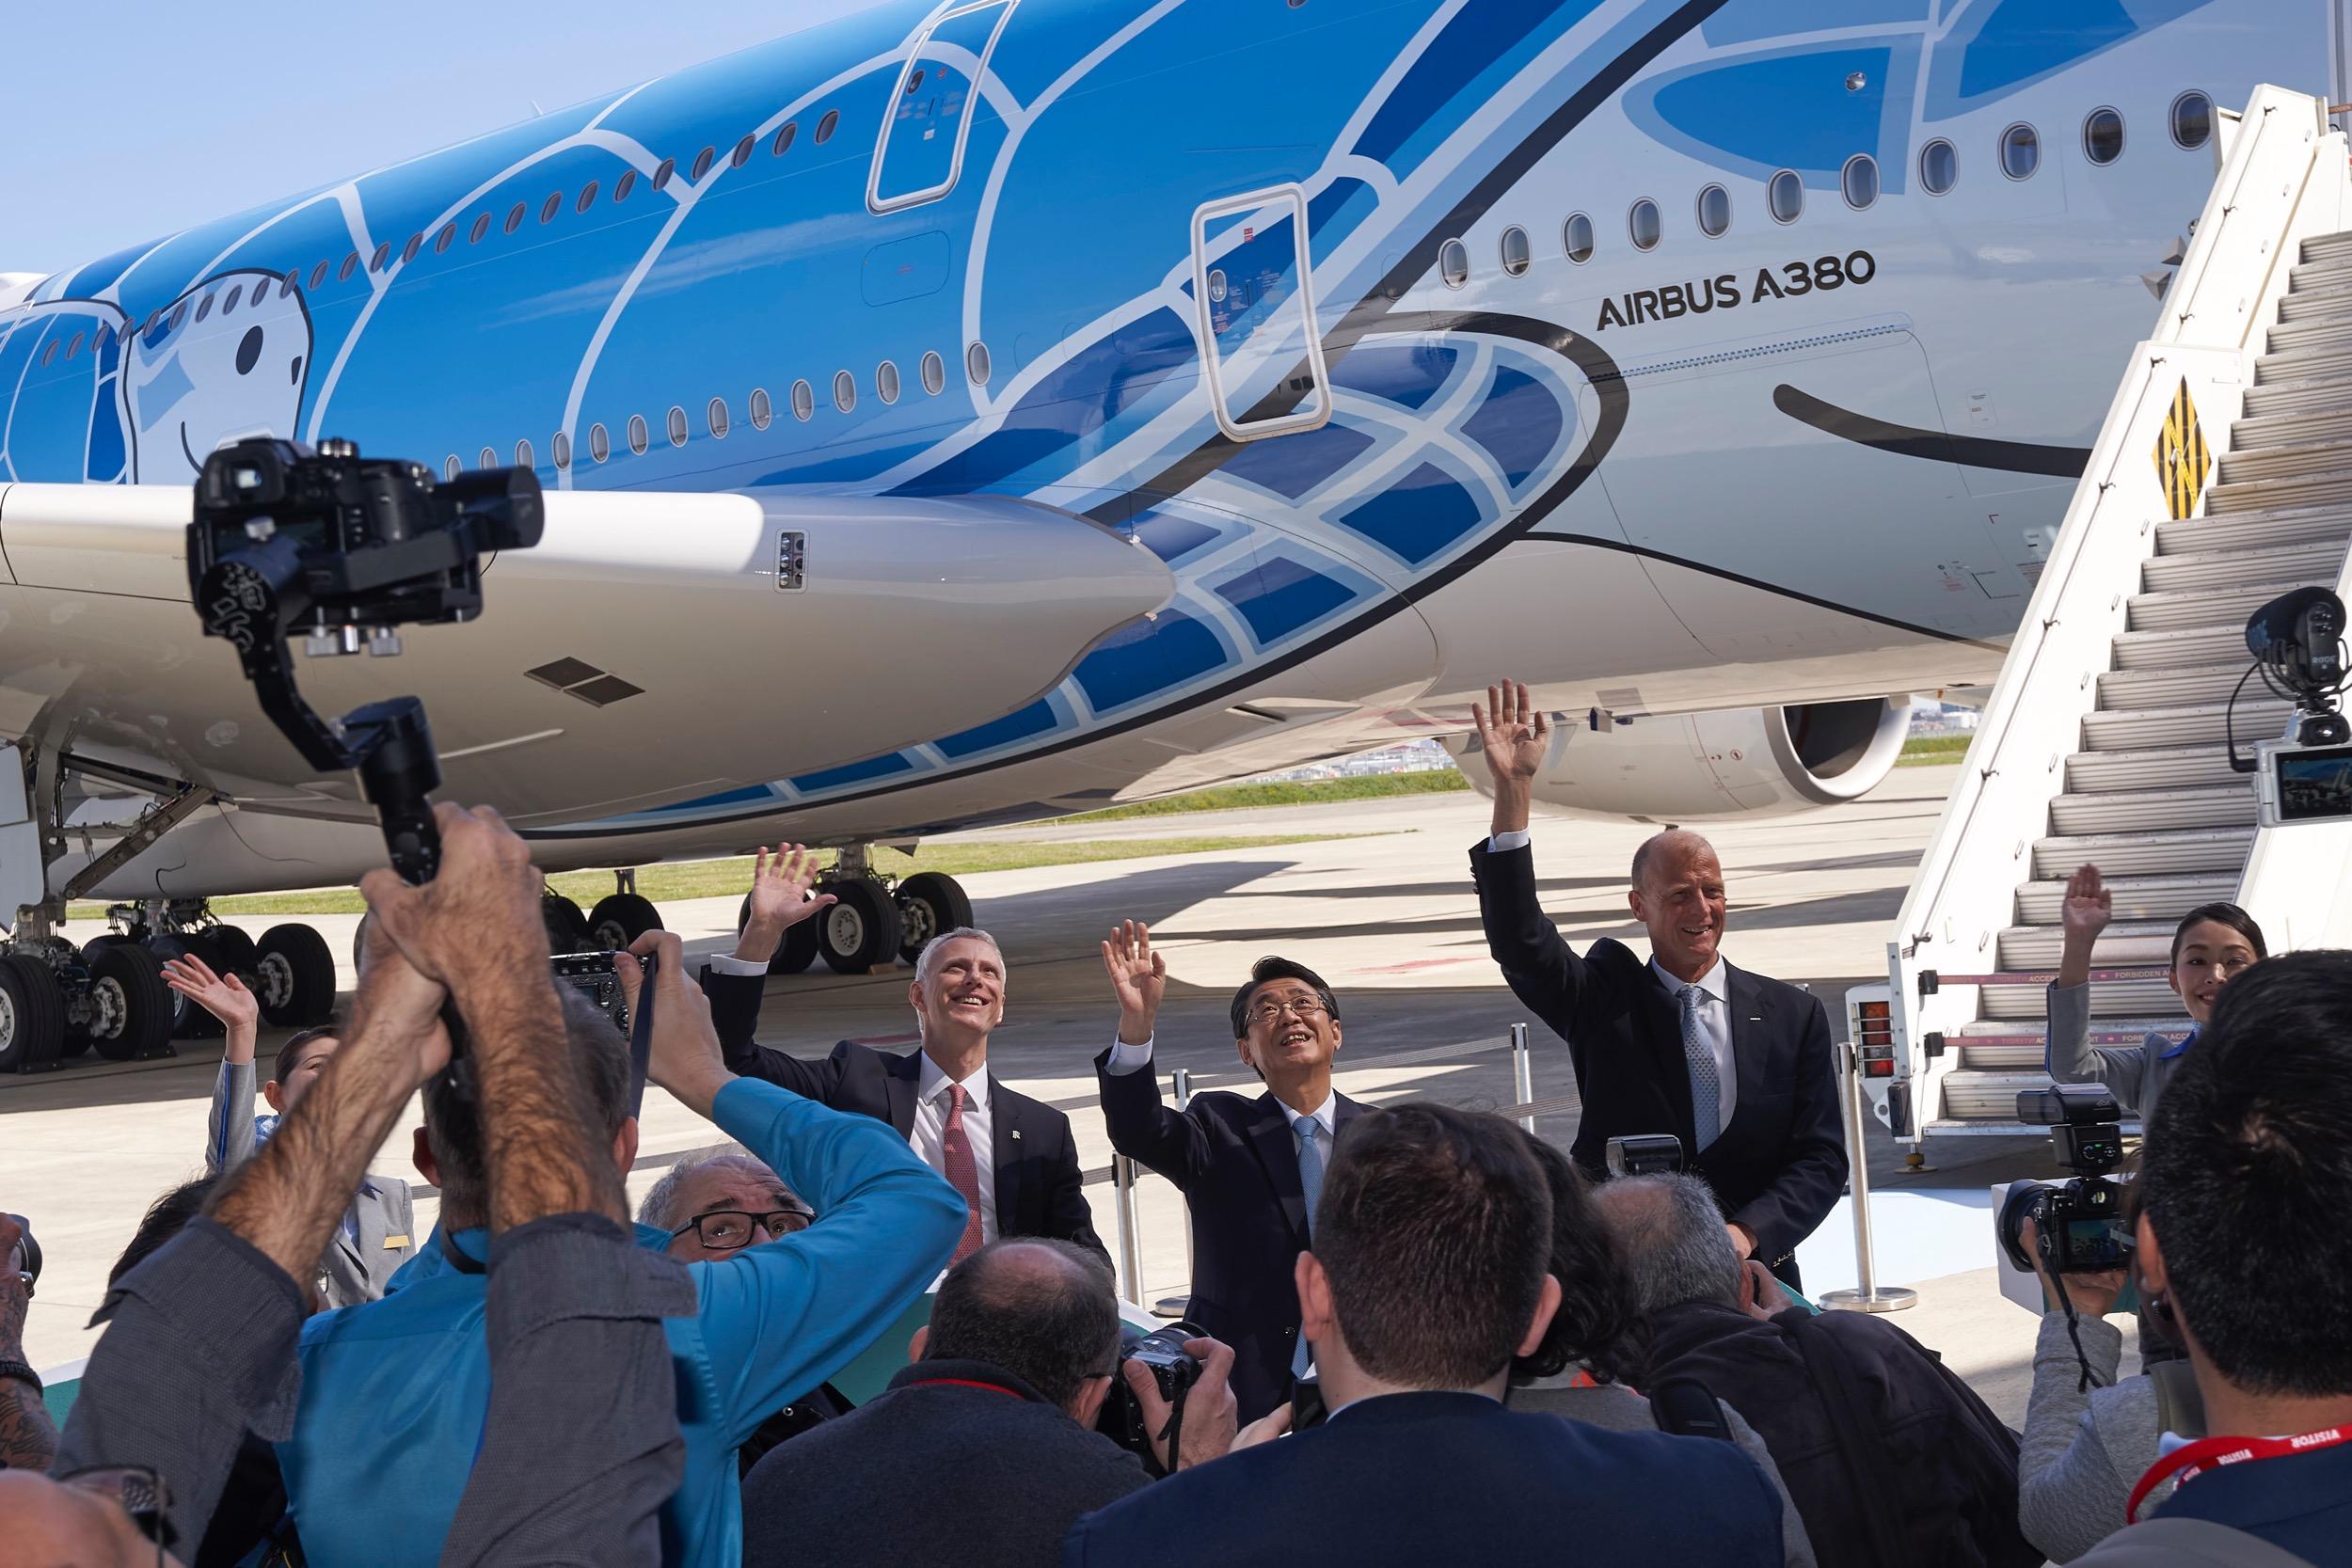 airbus-a380-ana-media-CEO-Enders-Cholerton-katanozaka.jpg